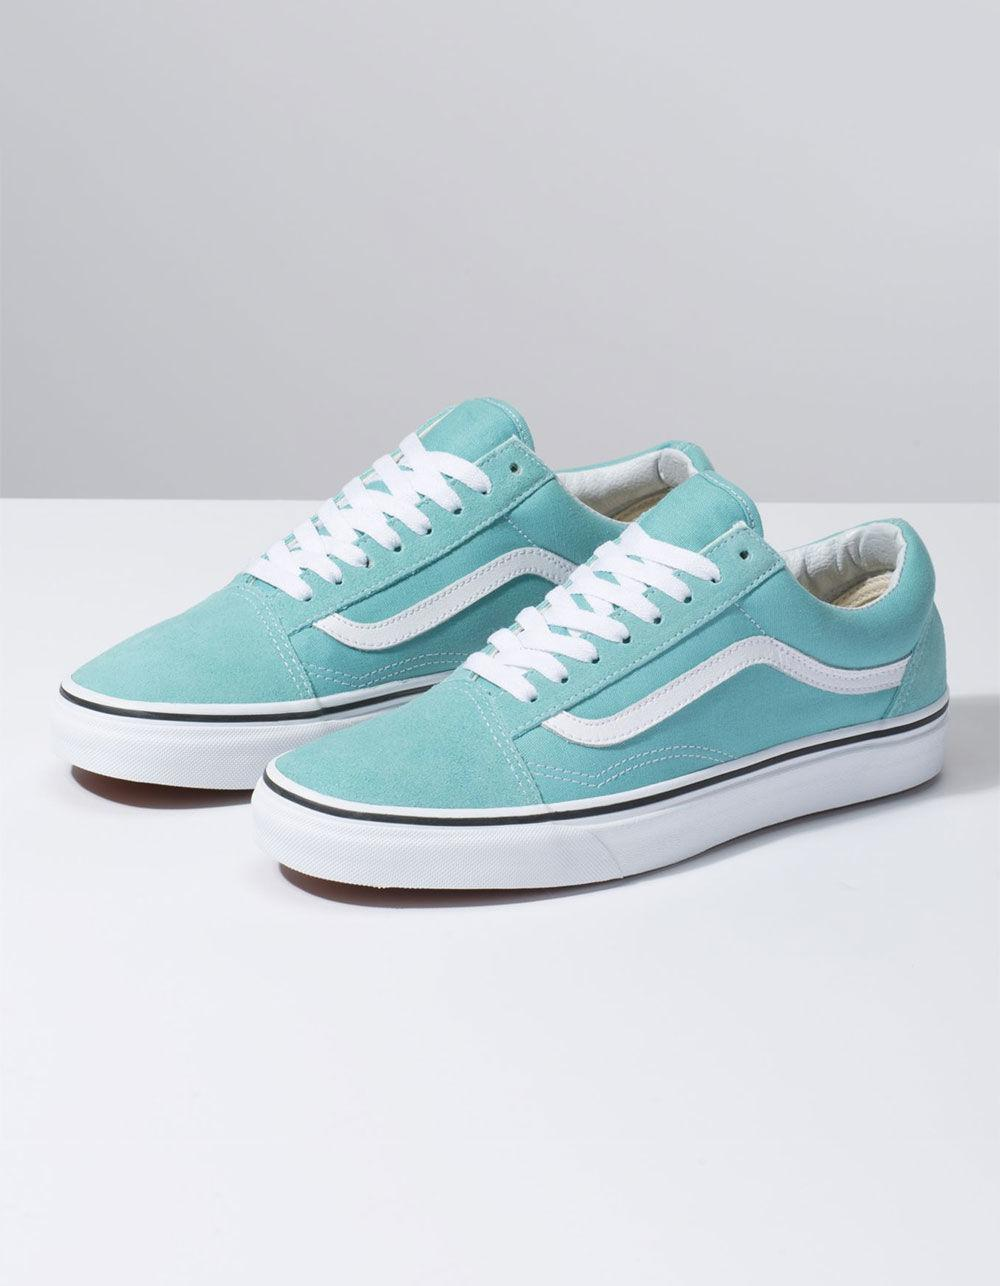 5c8ad342711940 Lyst - Vans Old Skool Aqua Haze   True White Shoes